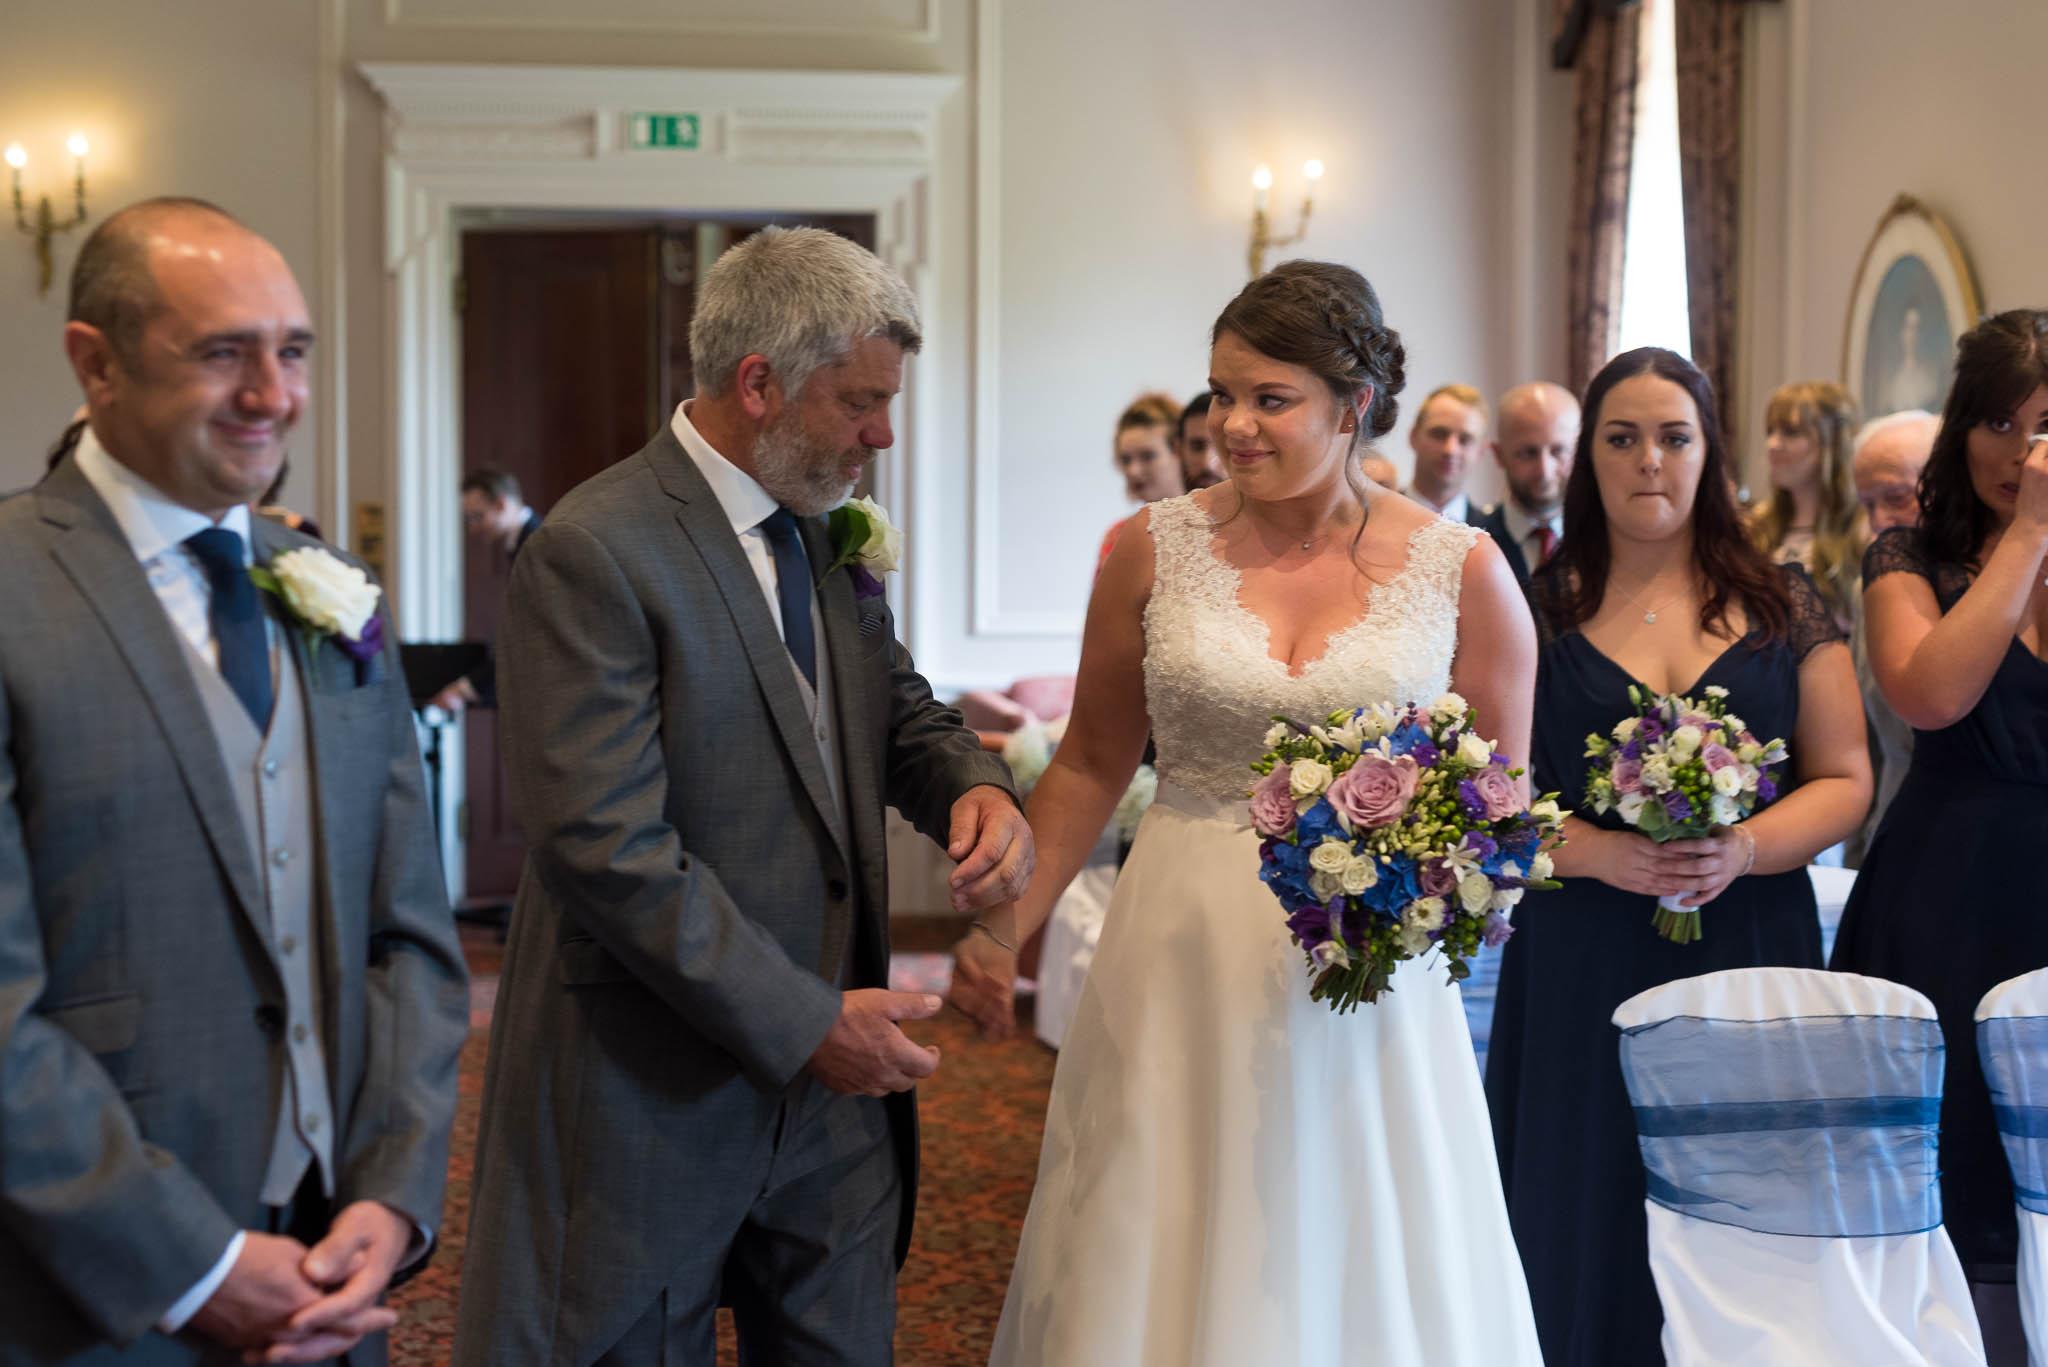 Crathorne Hall Hotel Wedding Photographer53.jpg